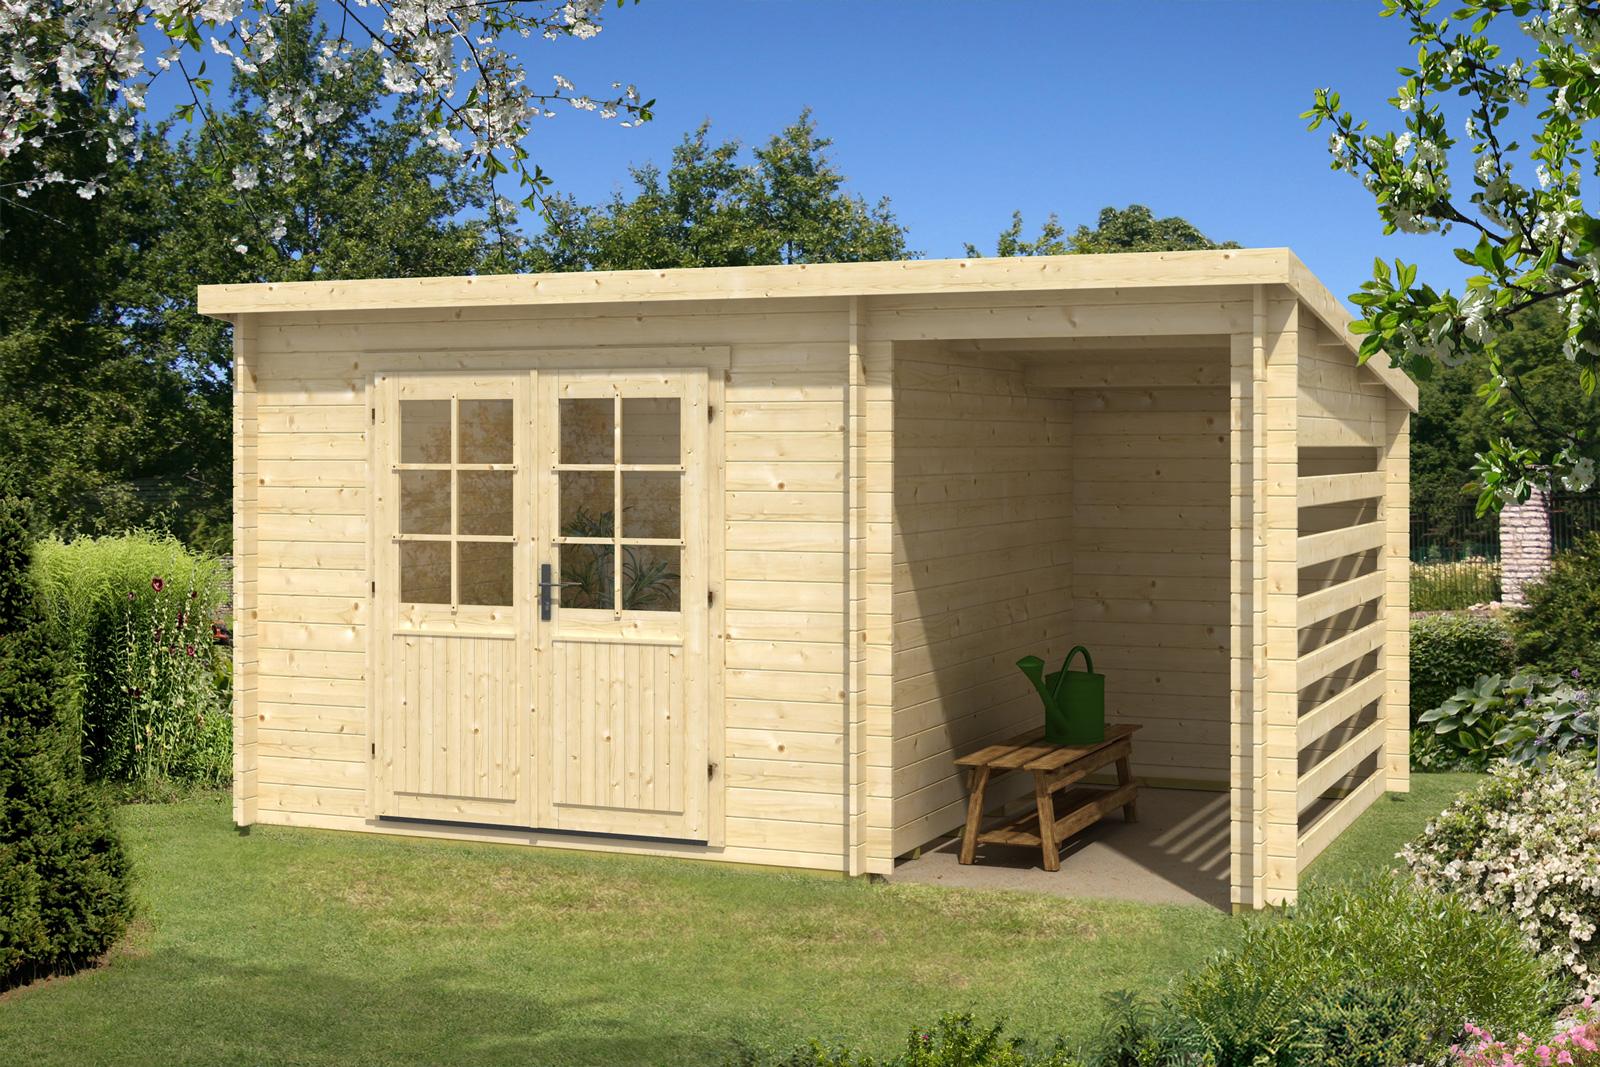 carlsson gartenhaus maria 28 compact. Black Bedroom Furniture Sets. Home Design Ideas